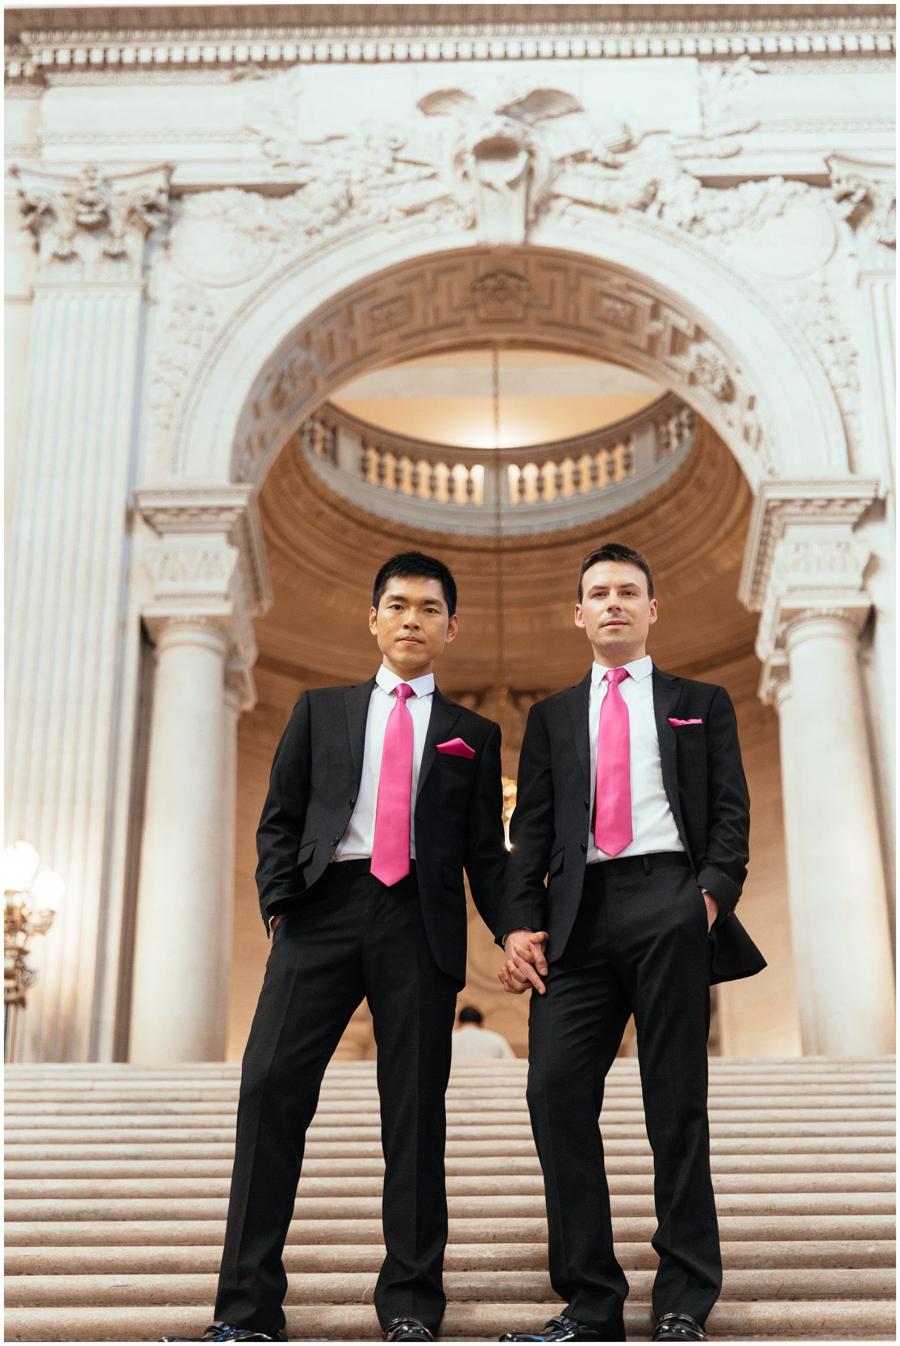 San_Francisco_City_Hall_Wedding_Artem_Kit_55.jpg